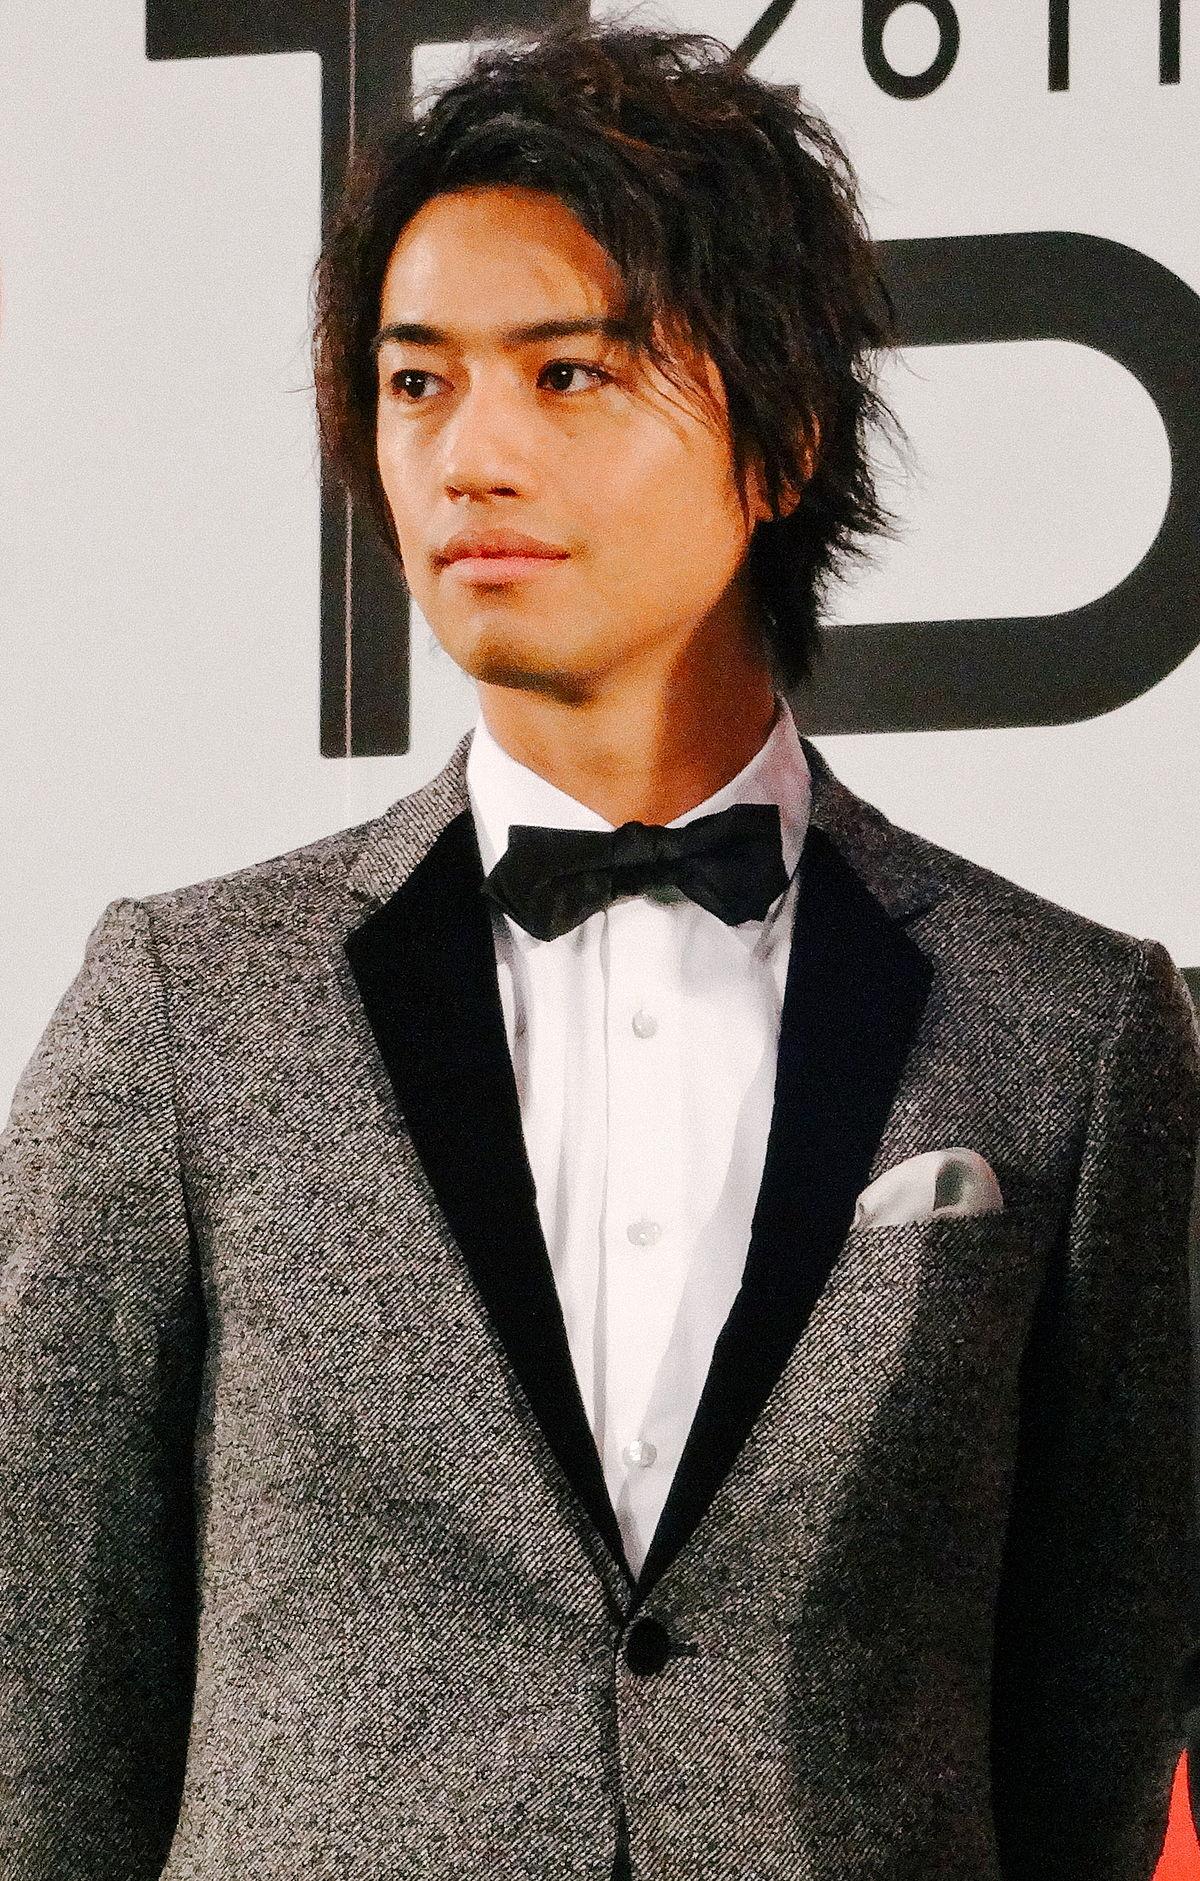 K Baby Model Takumi Saito - Wikiped...